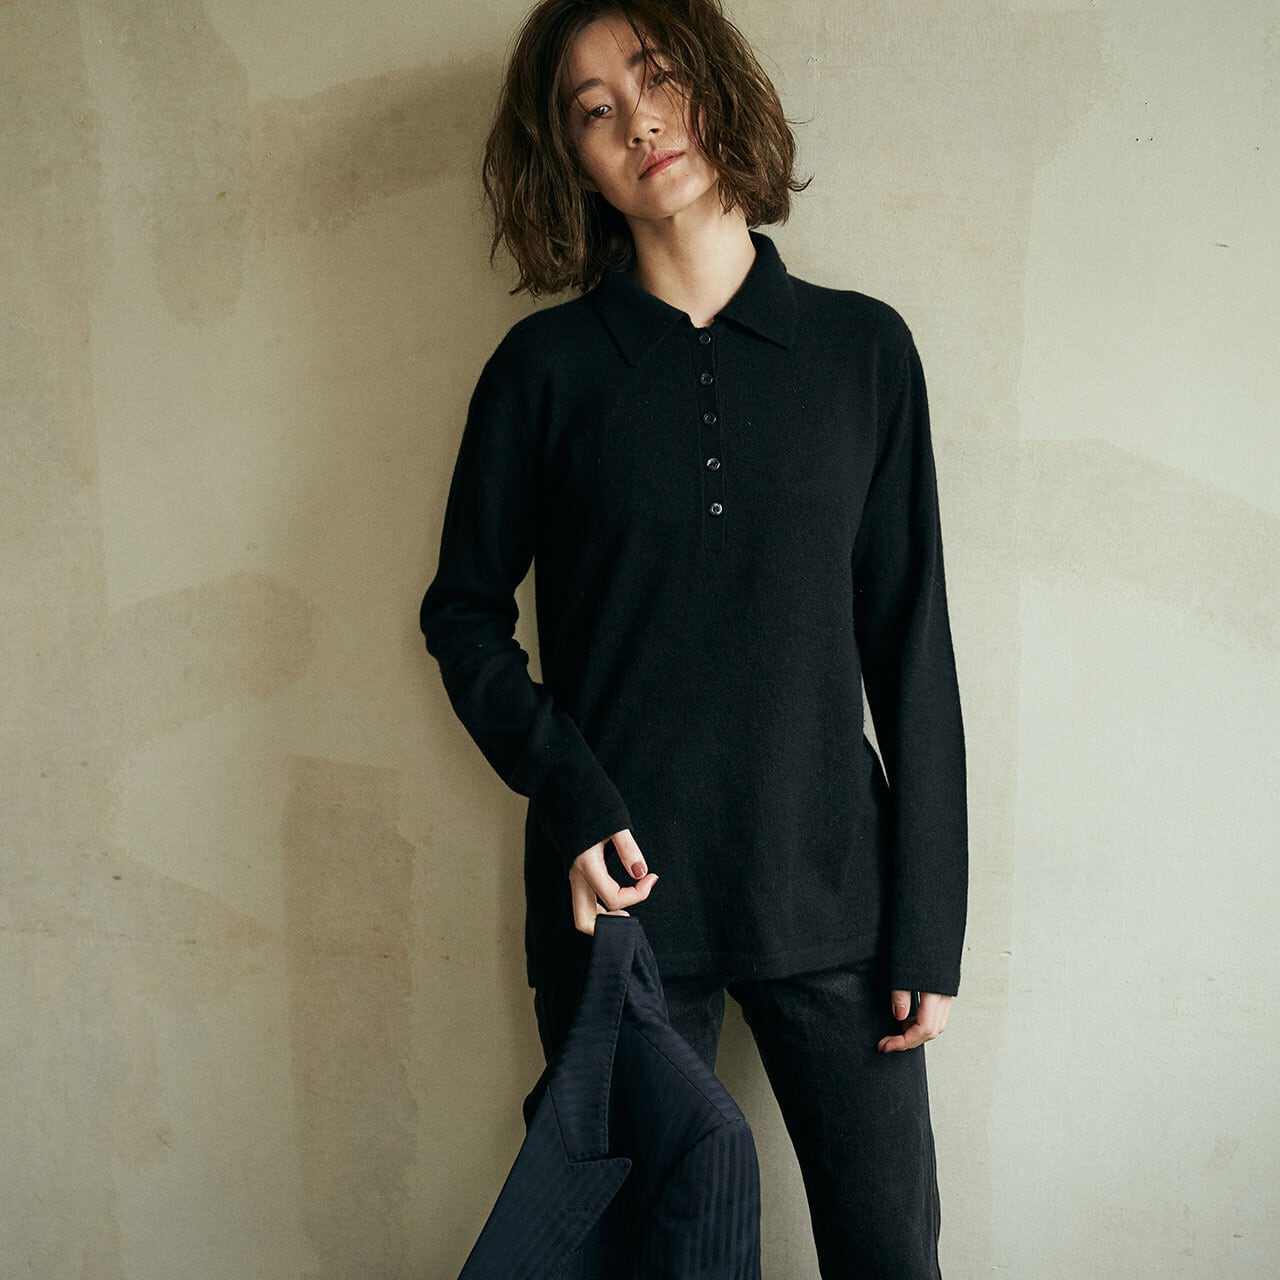 90's Black cashmere poro knit